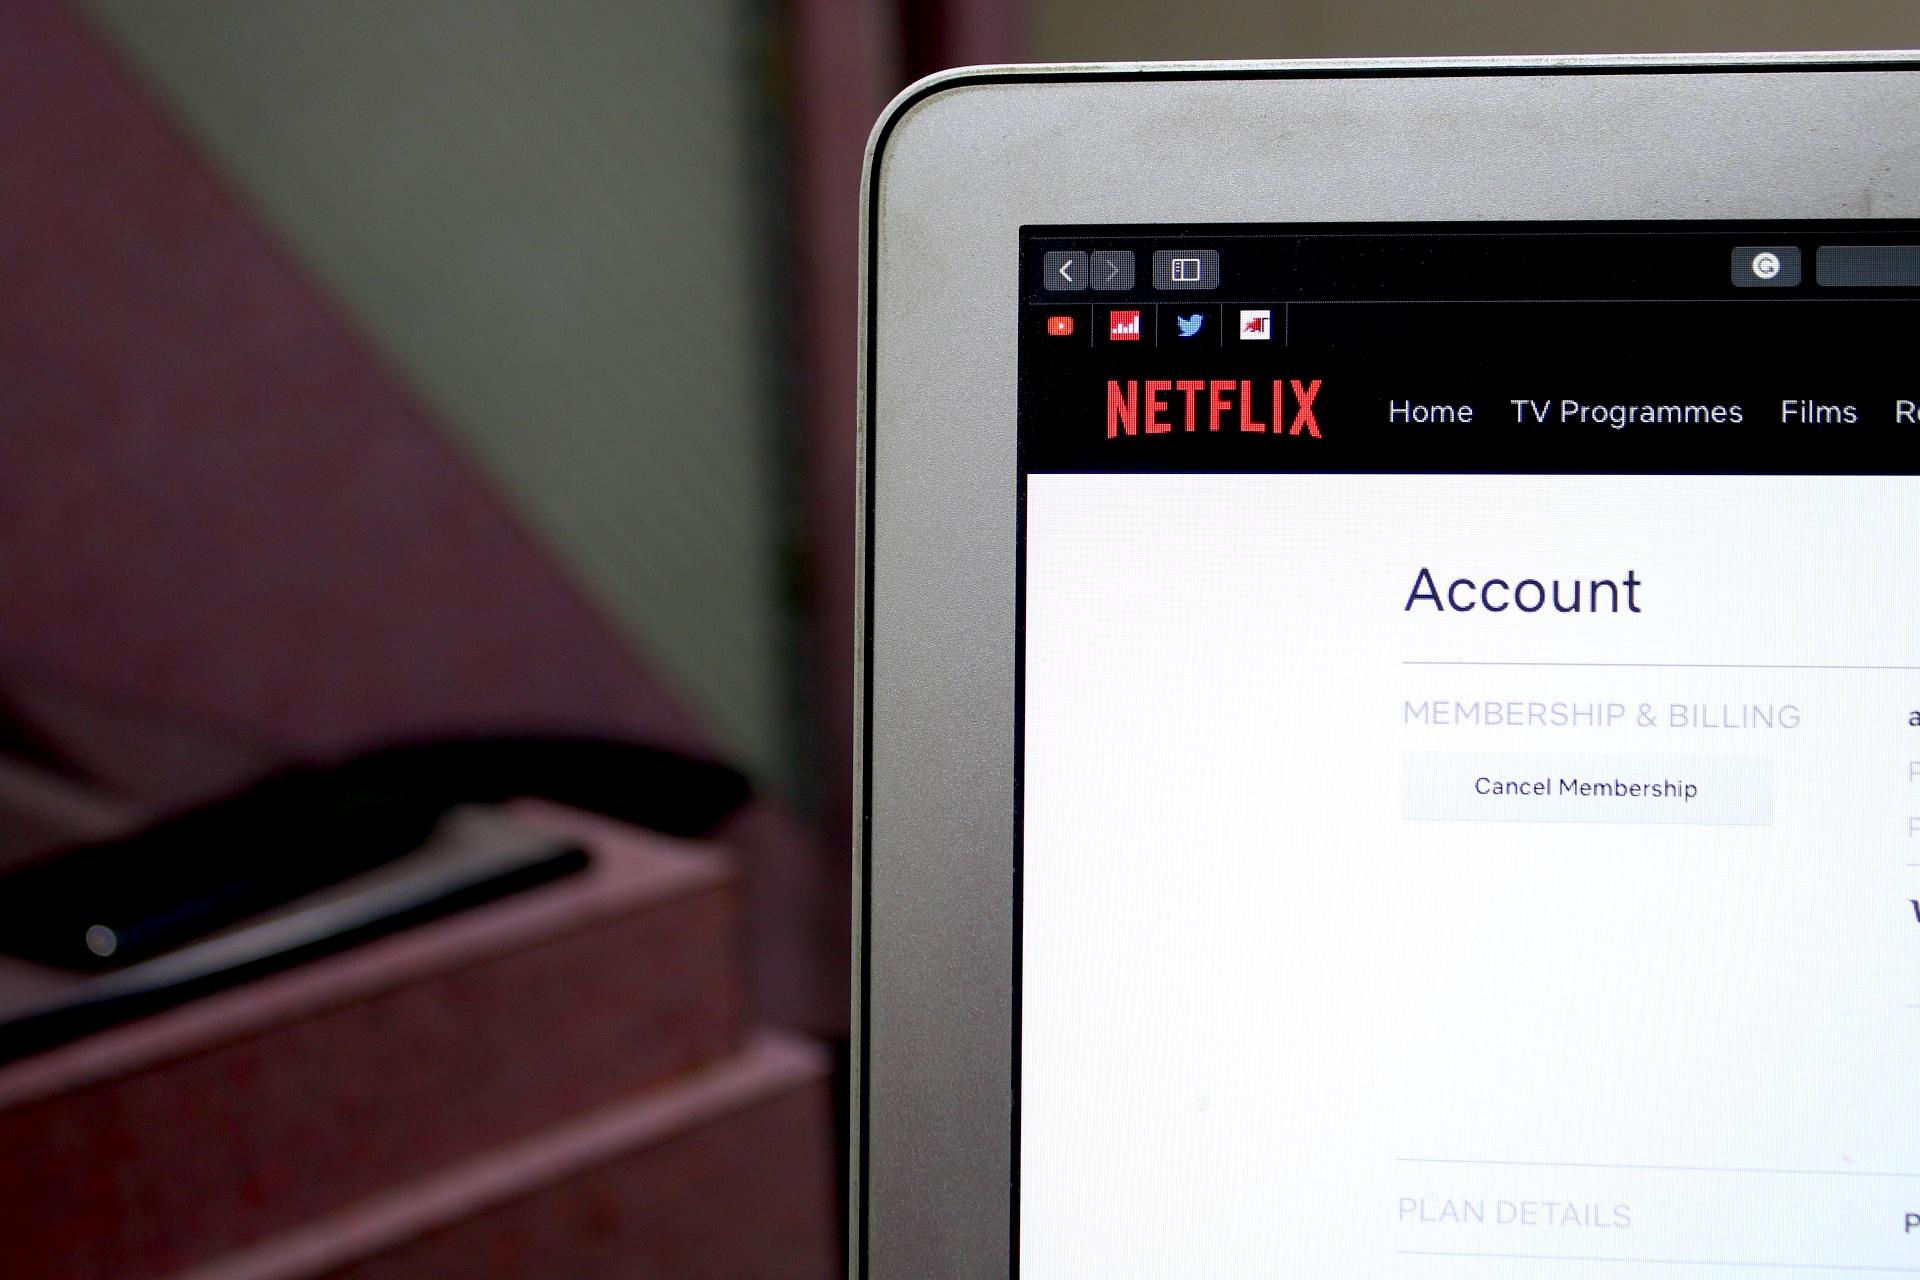 Complaints about Netflix billing, CRA issues order